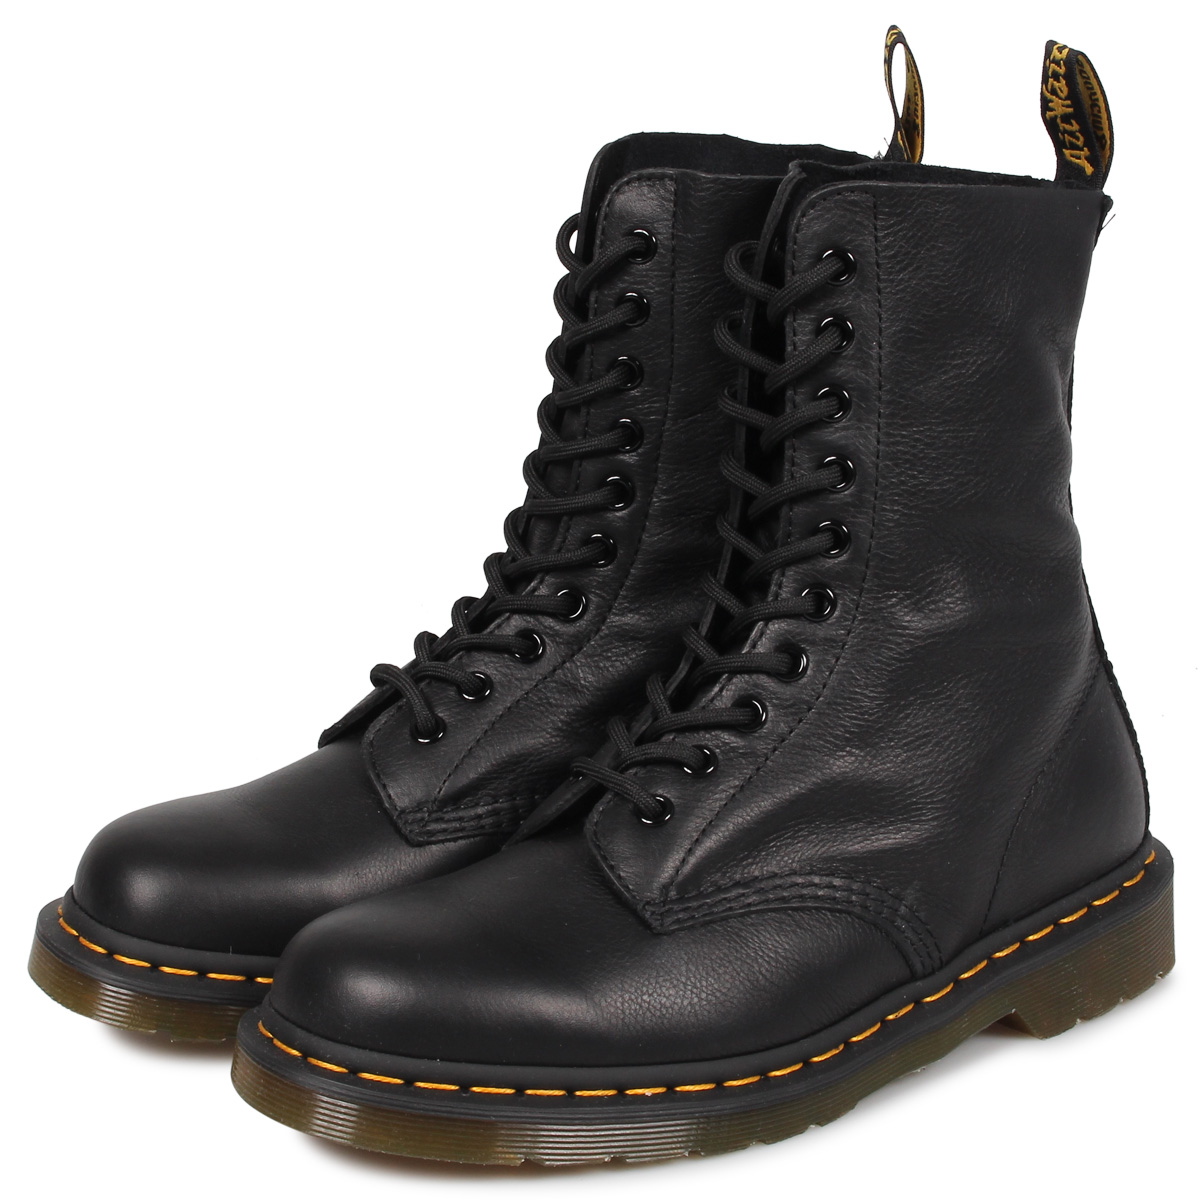 Dr.Martens 1490 W 10EYE BOOT ドクターマーチン 10ホール ブーツ メンズ レディース ブラック 黒 R22524001